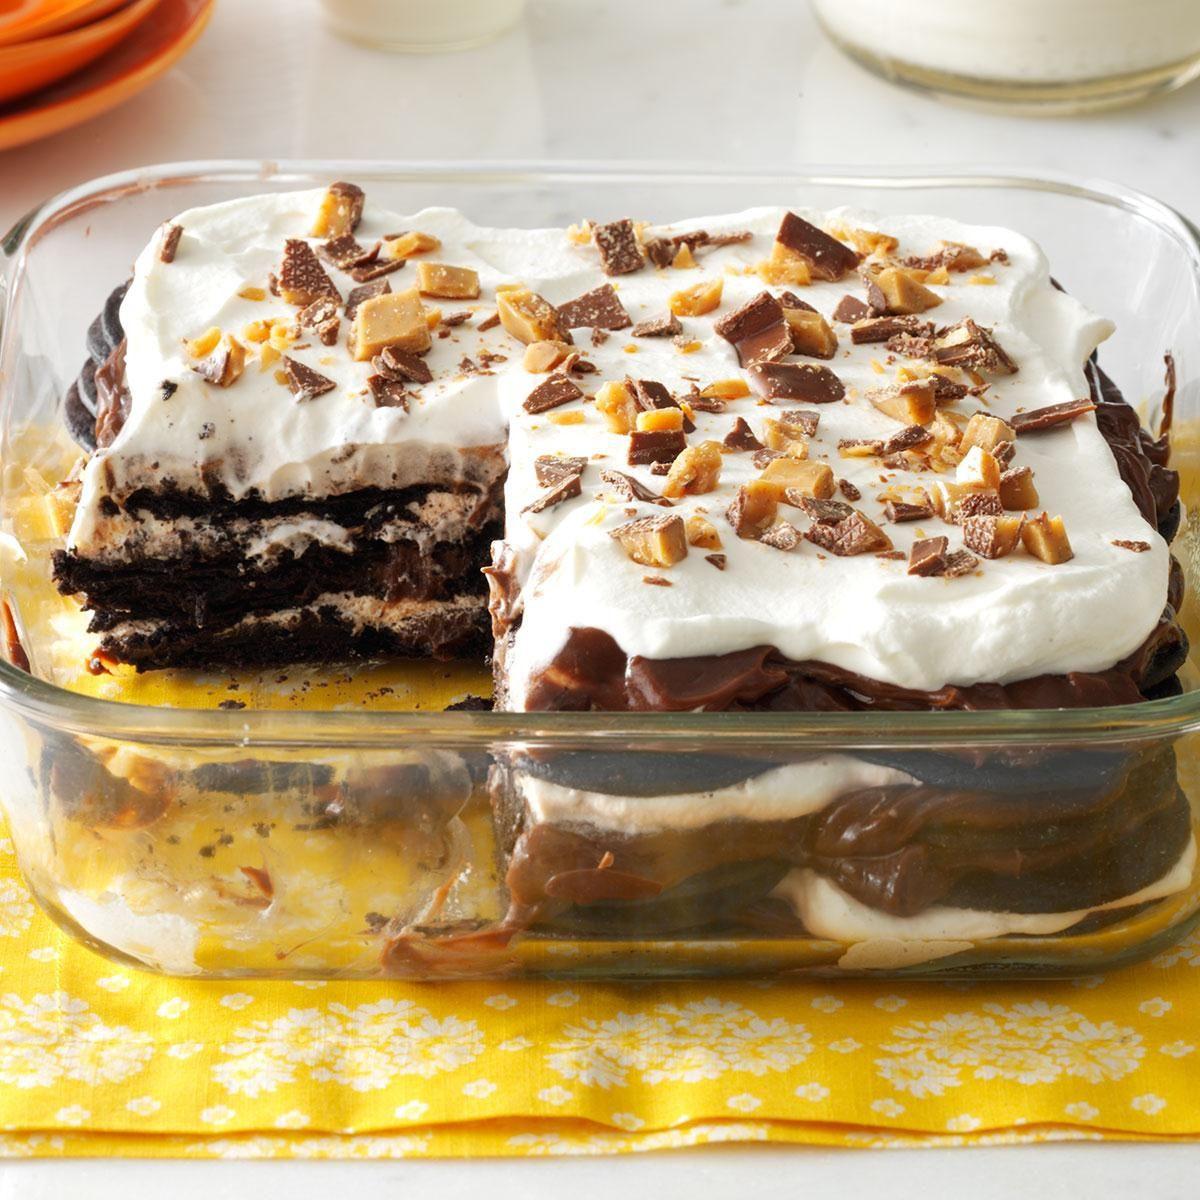 Chocolate Desserts Easy  Double Chocolate Toffee Icebox Cake Recipe